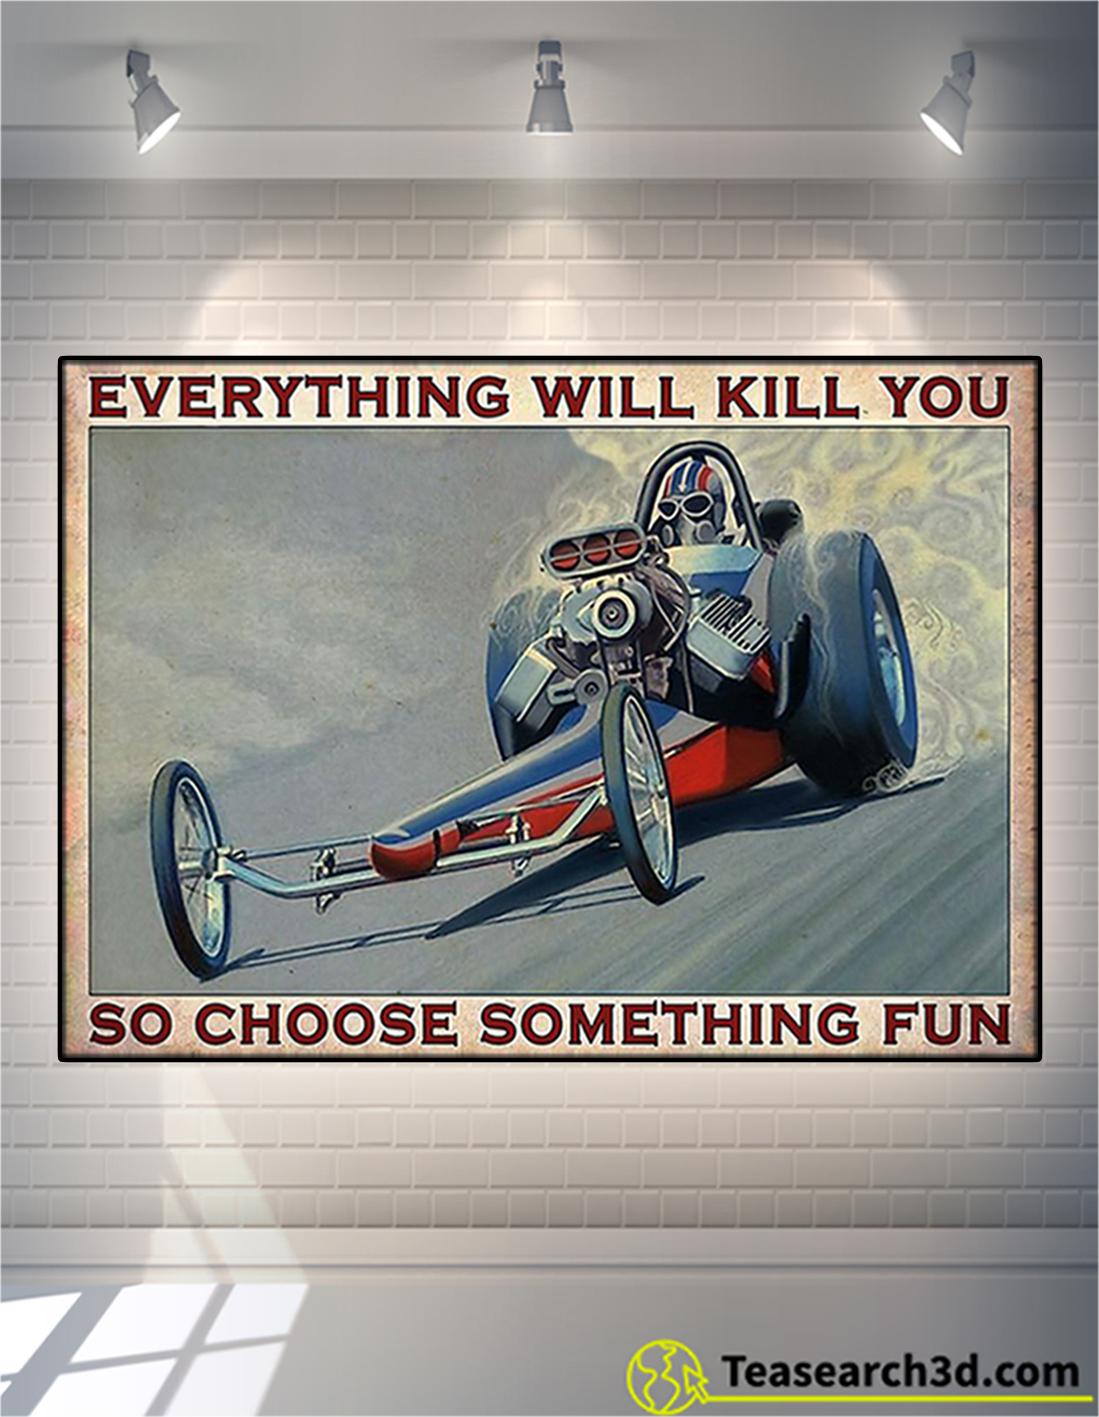 Drag racing so choose something fun poster A2